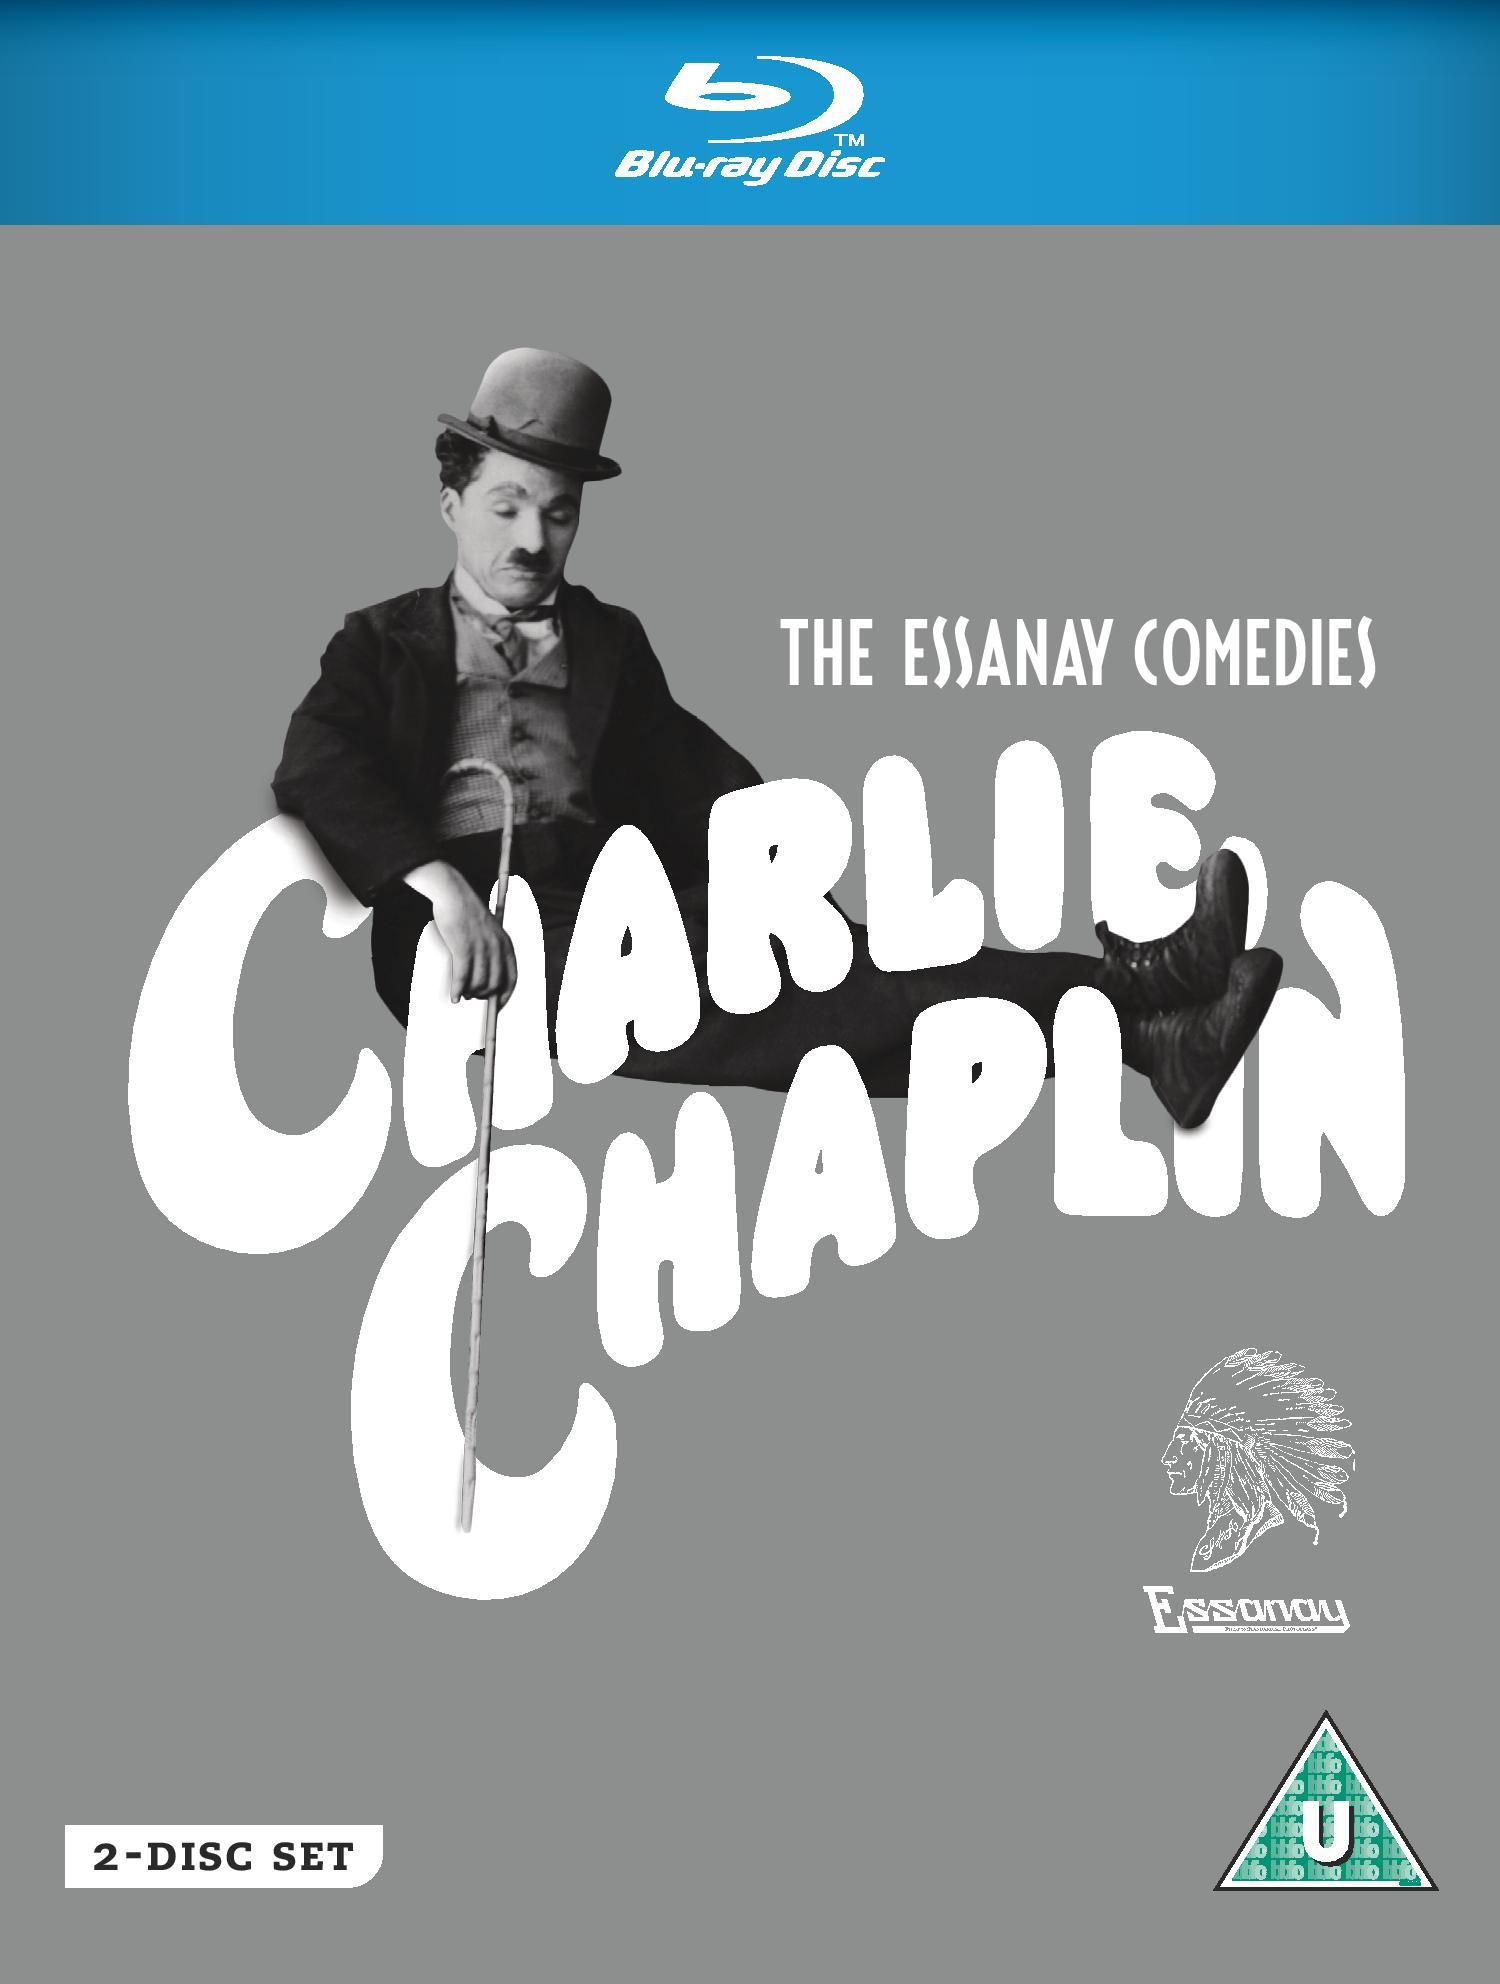 Buy Charlie Chaplin: The Essanay Comedies Blu-ray set